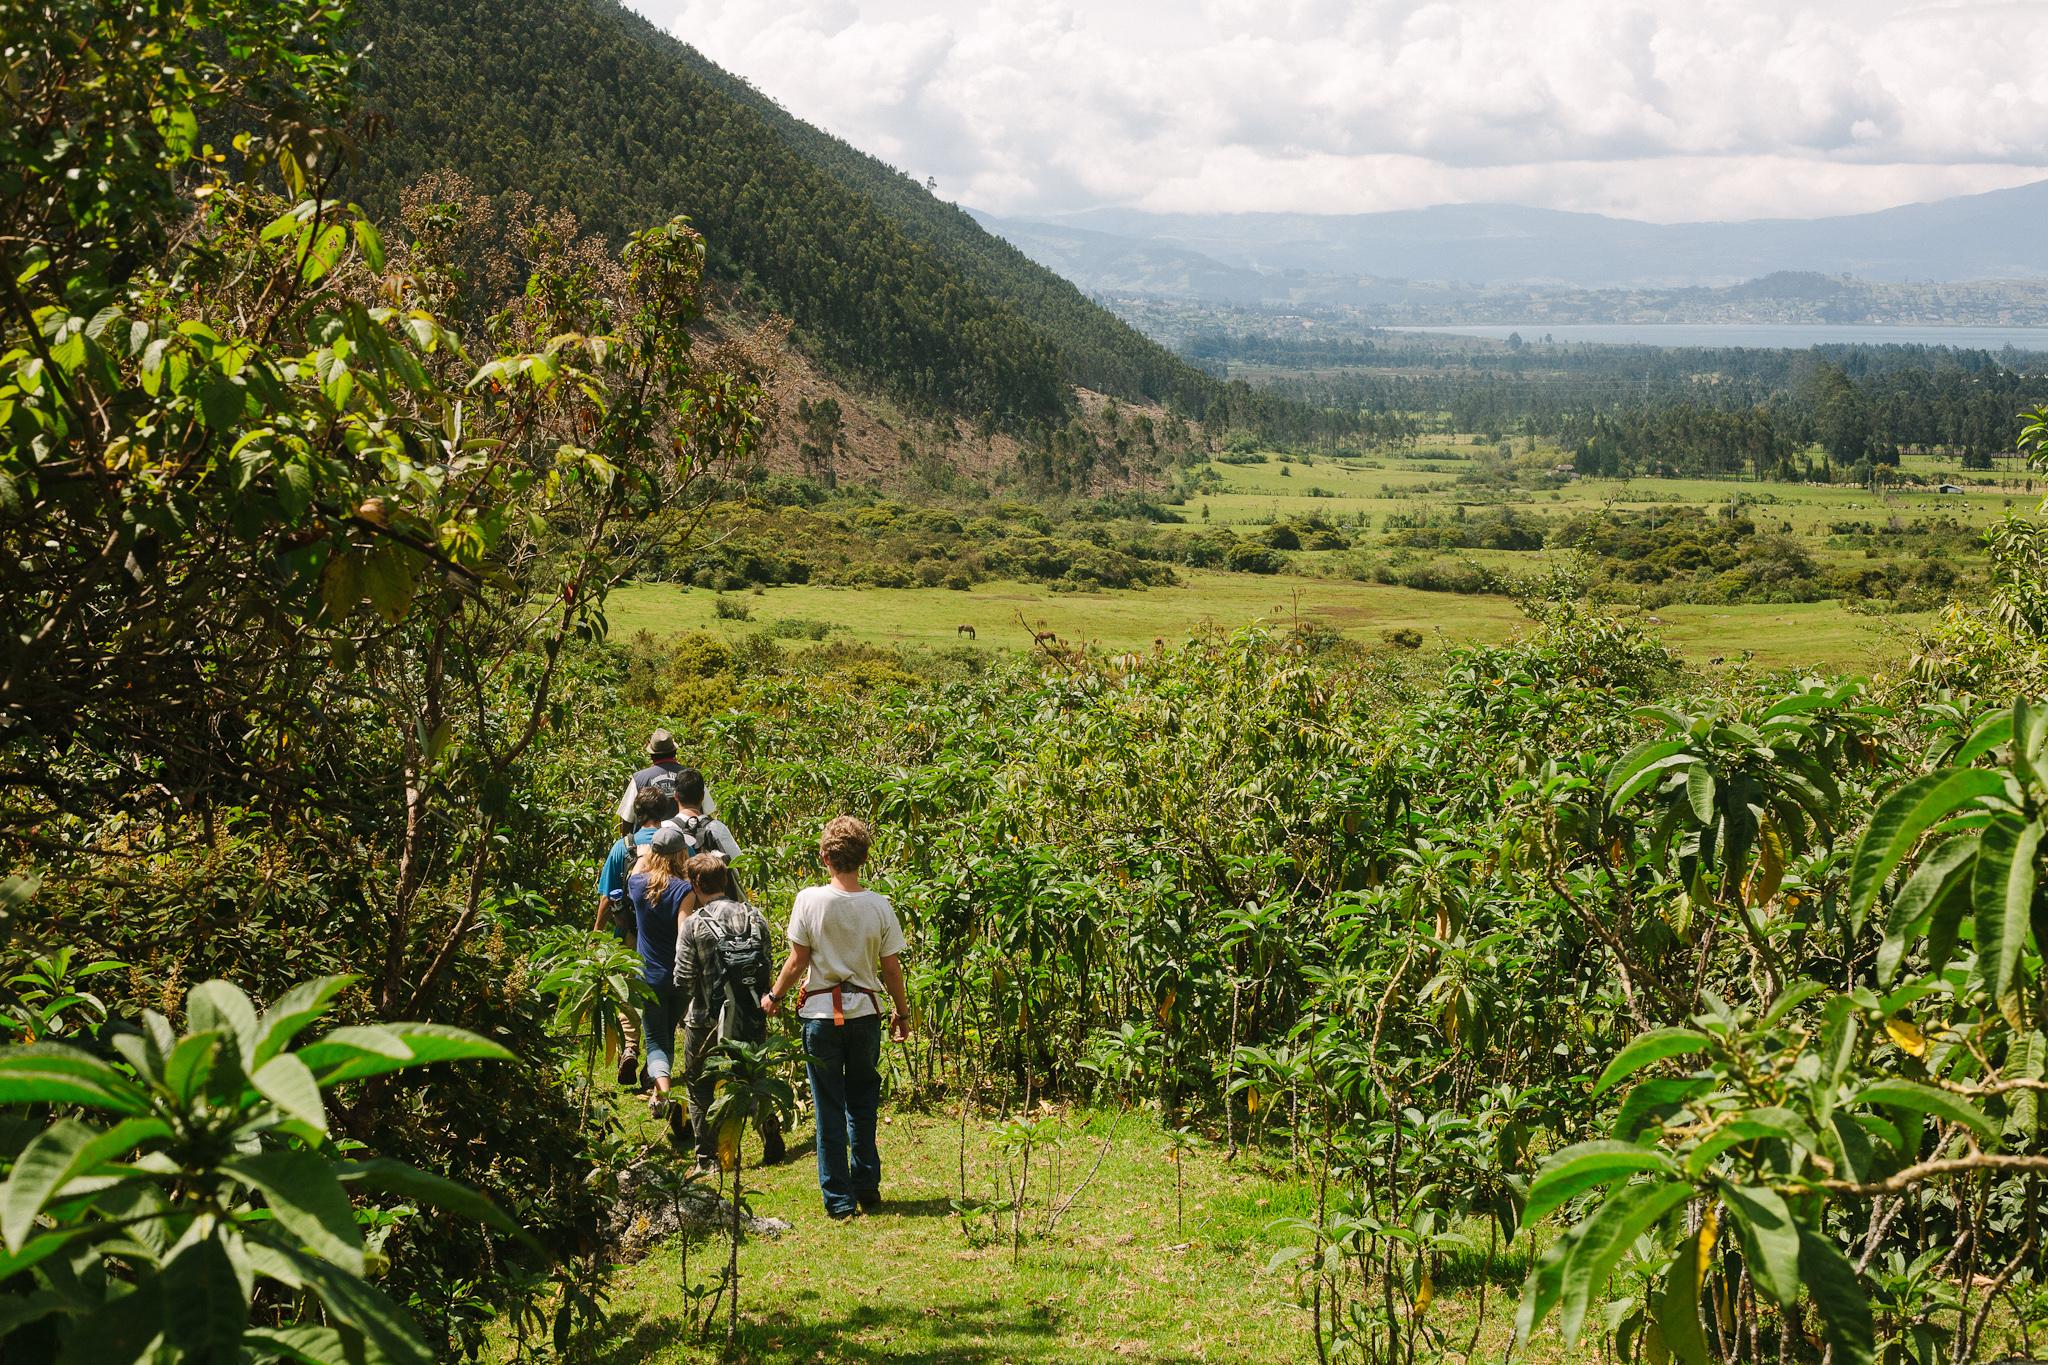 Ecuador2011_Mountains&Sea_Web_jenniferleahy-025.jpg